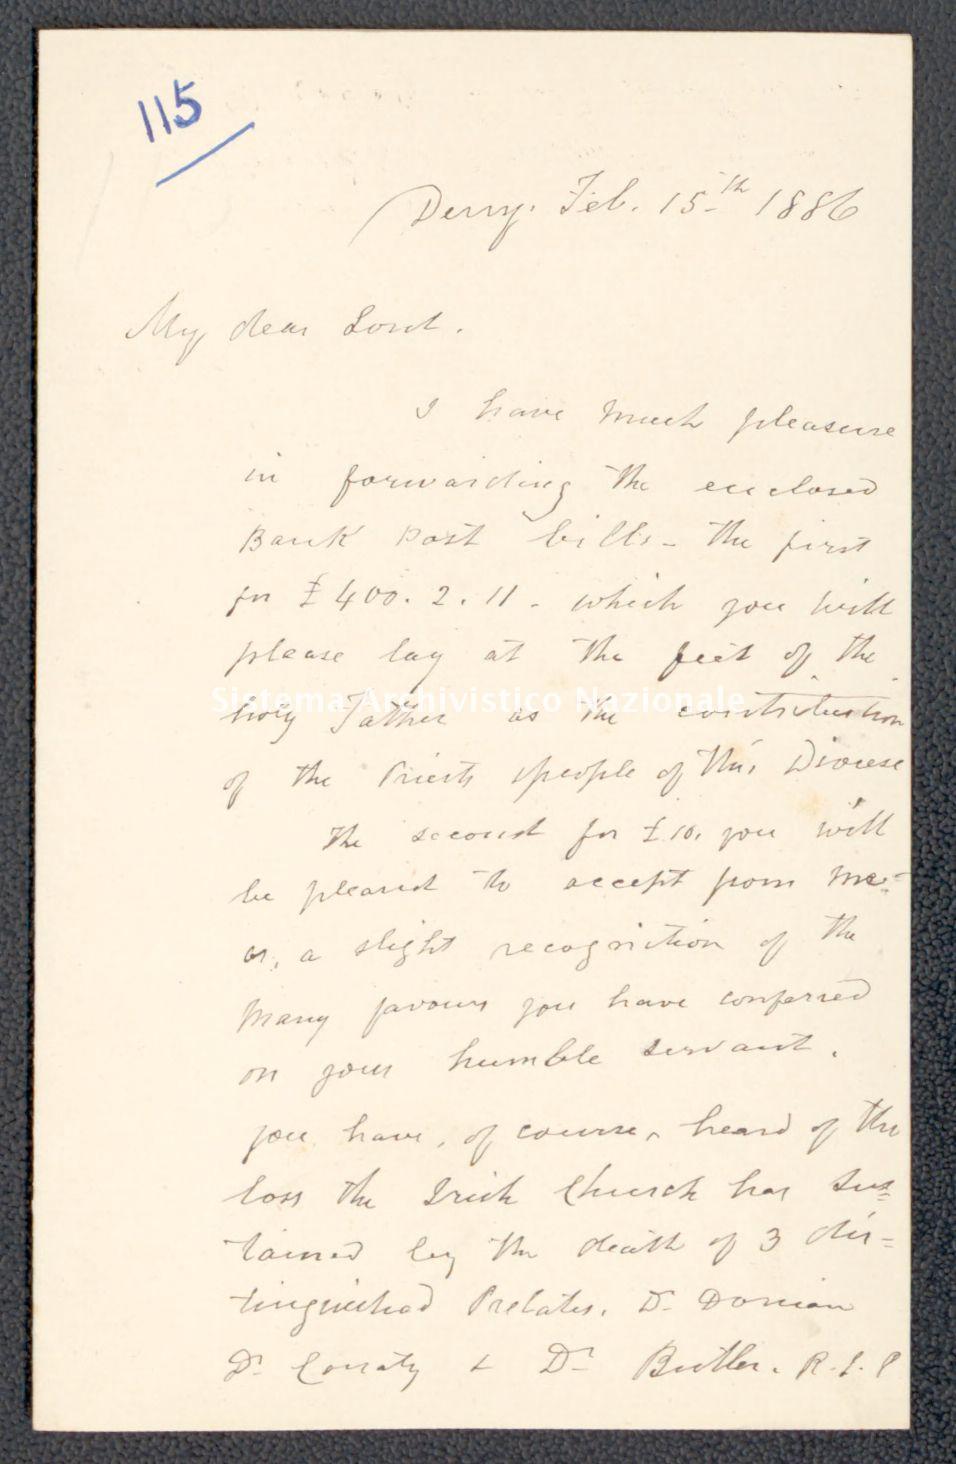 Pontificio Collegio Irlandese - Kirby_1886_115